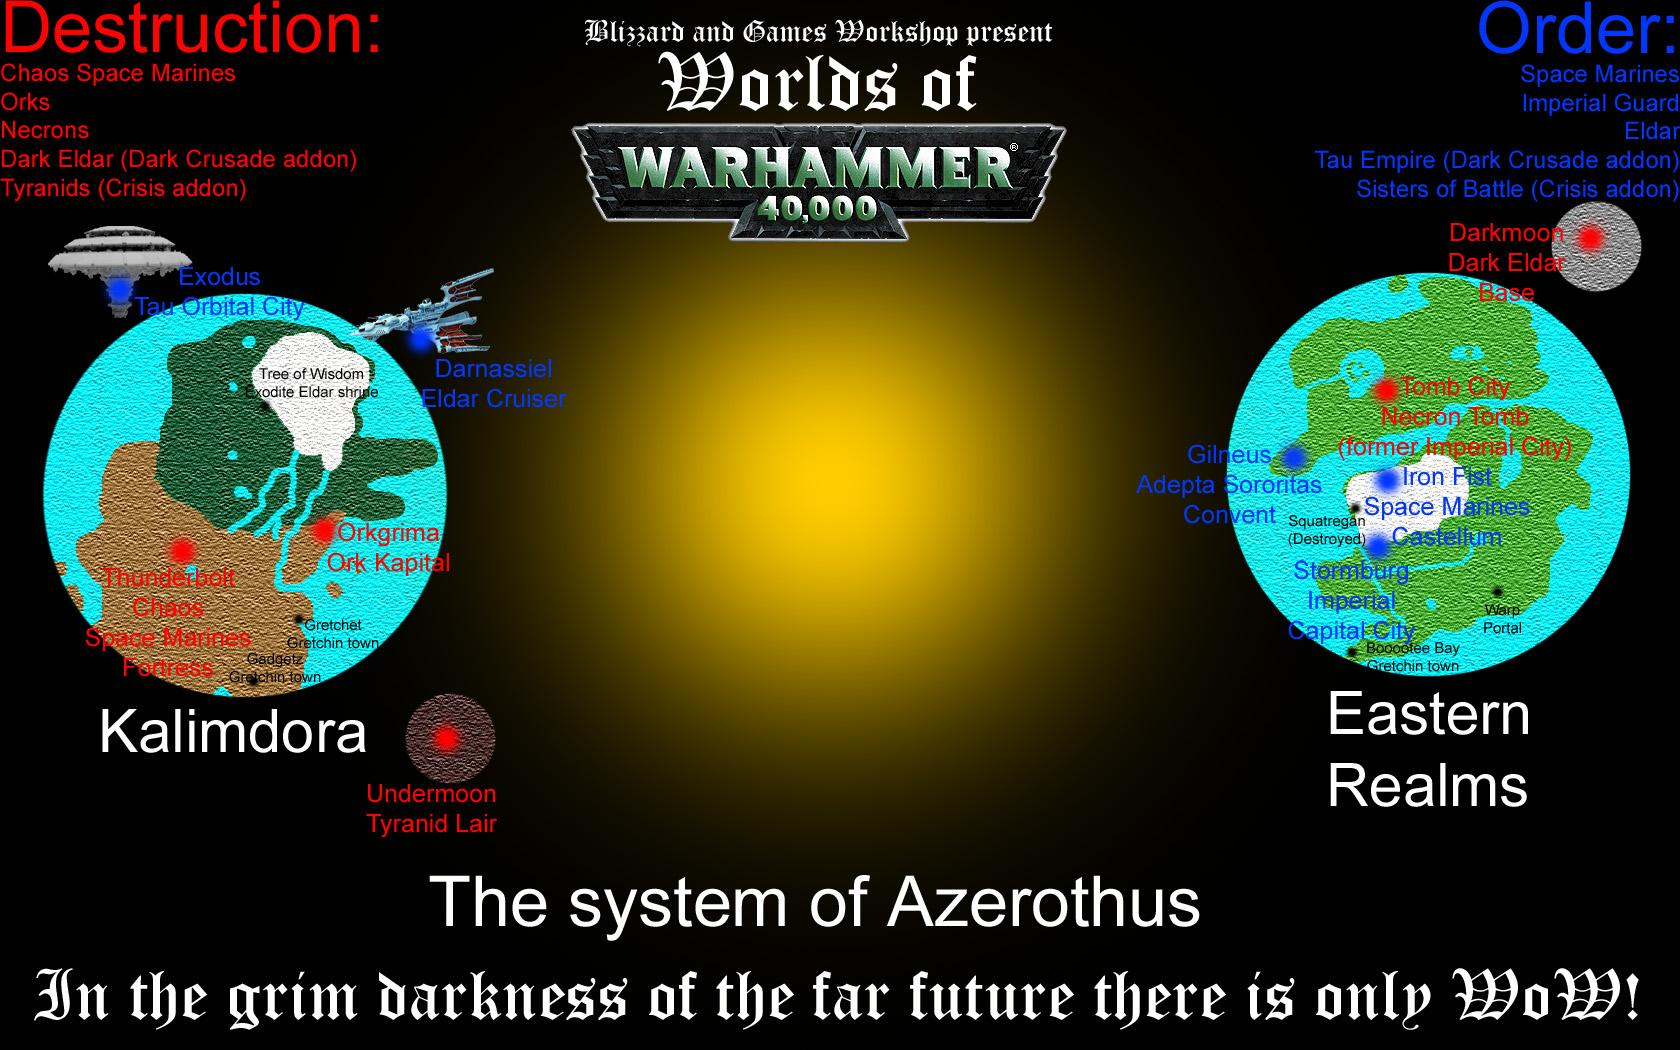 Humor, Warhammer 40,000